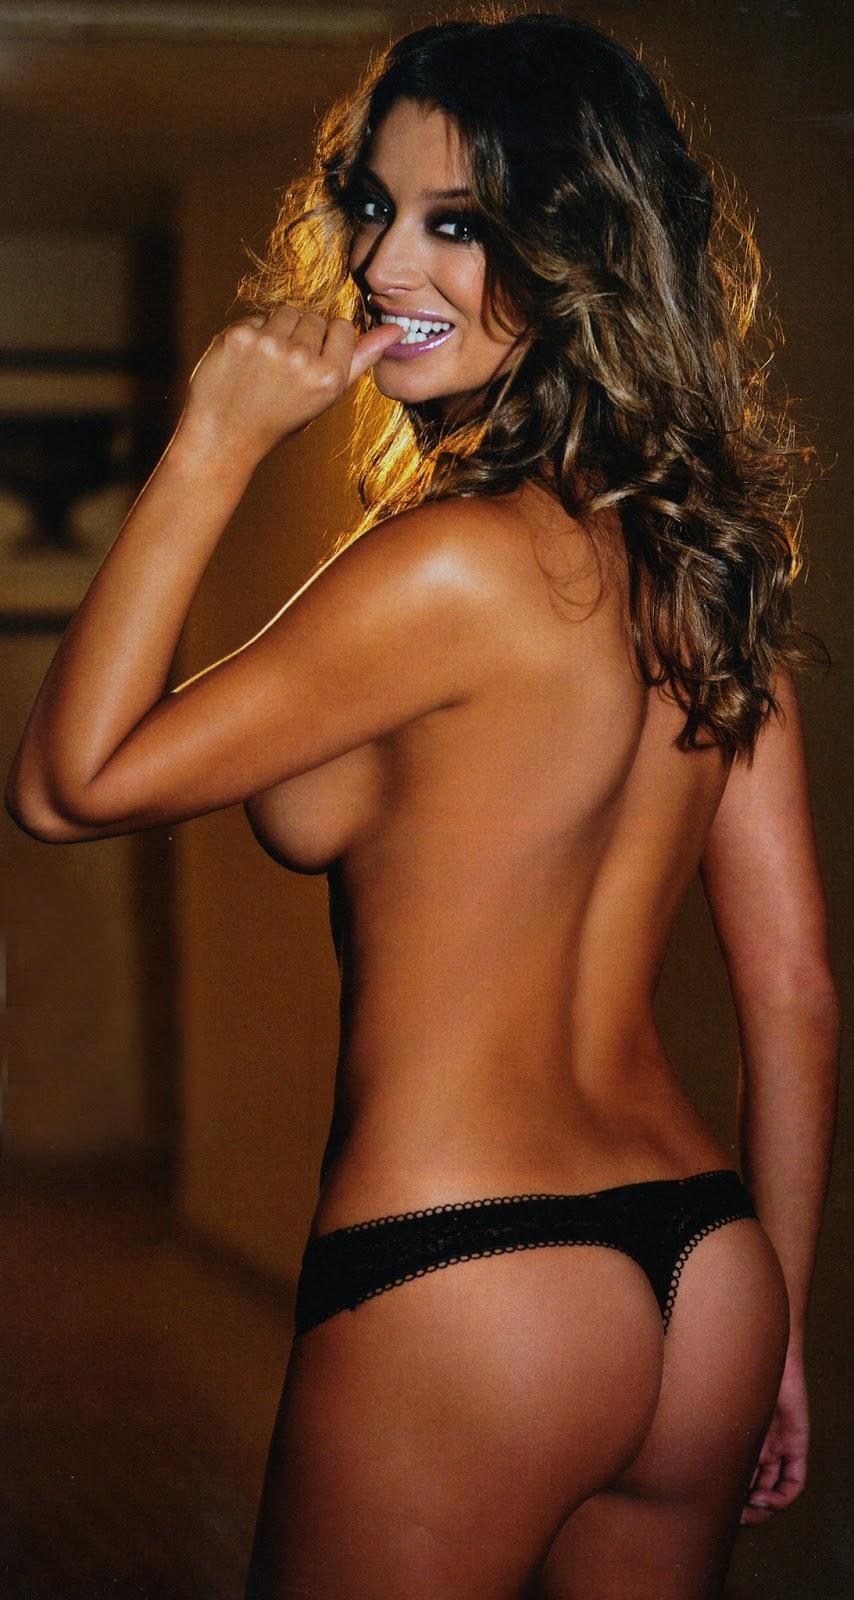 nude high definition redhead